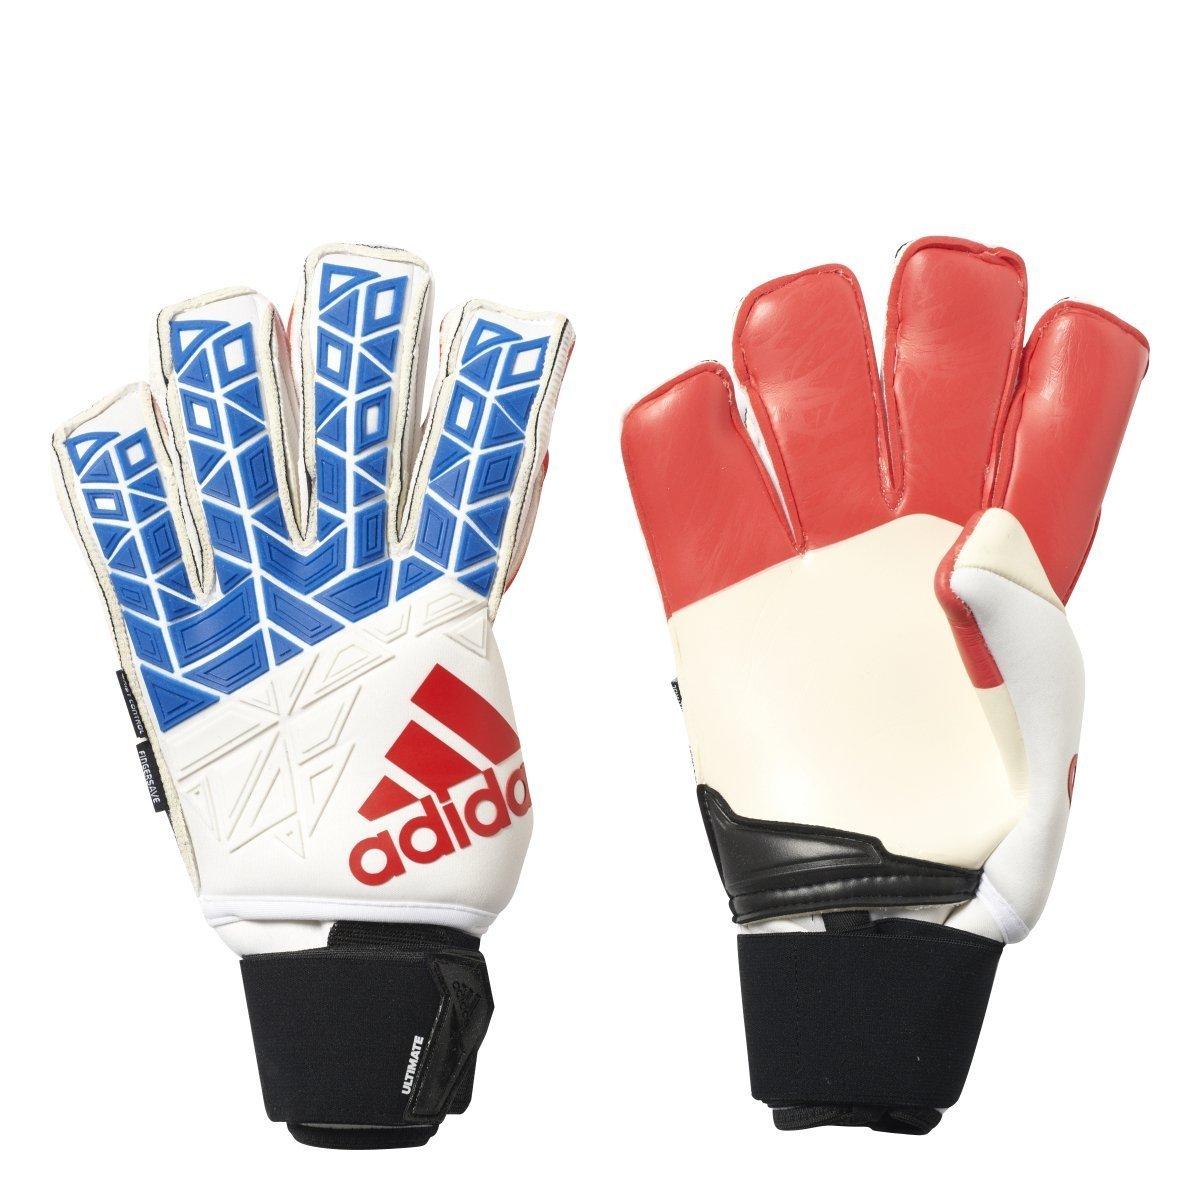 Adidas Ace Trans Ultimate Fußball Torwarthandschuhe (, weiß, blau, rot, schwarz)